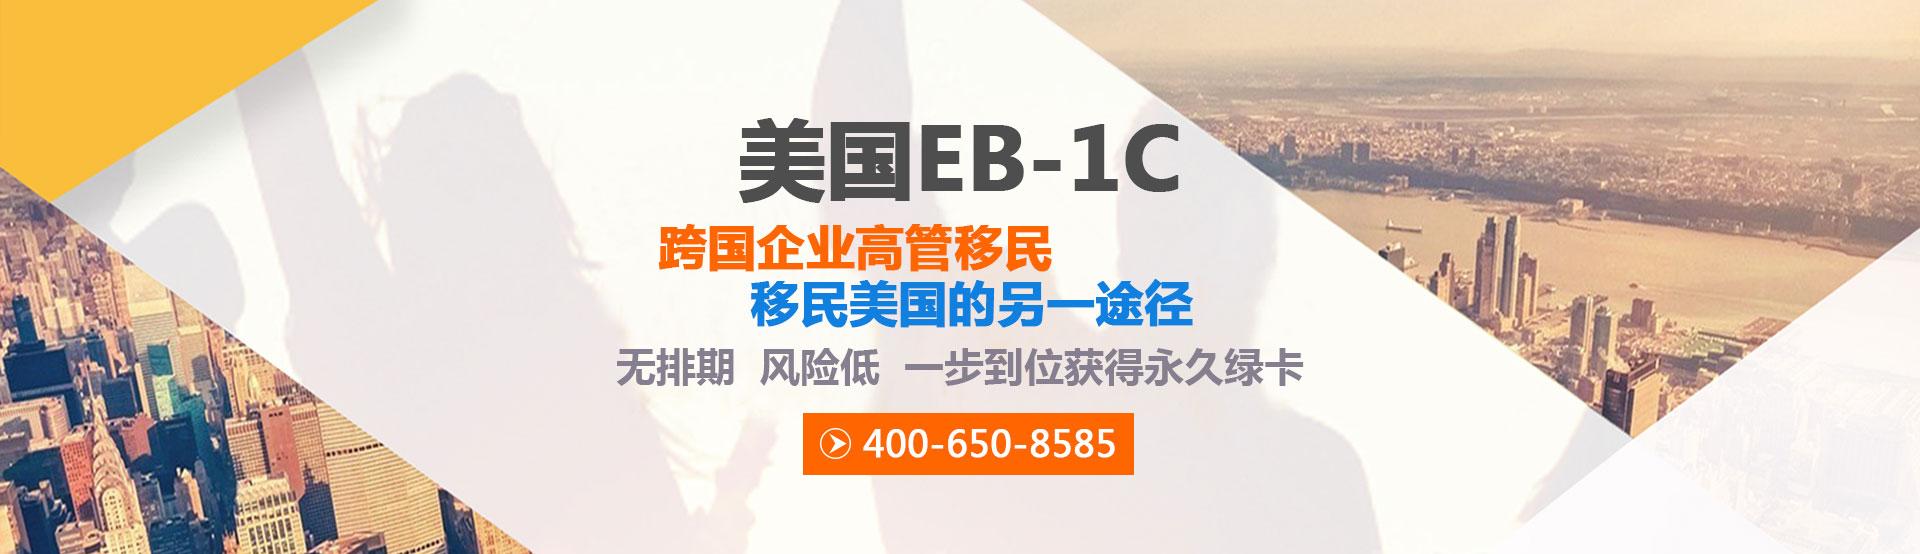 EB-1C跨国企业经理人